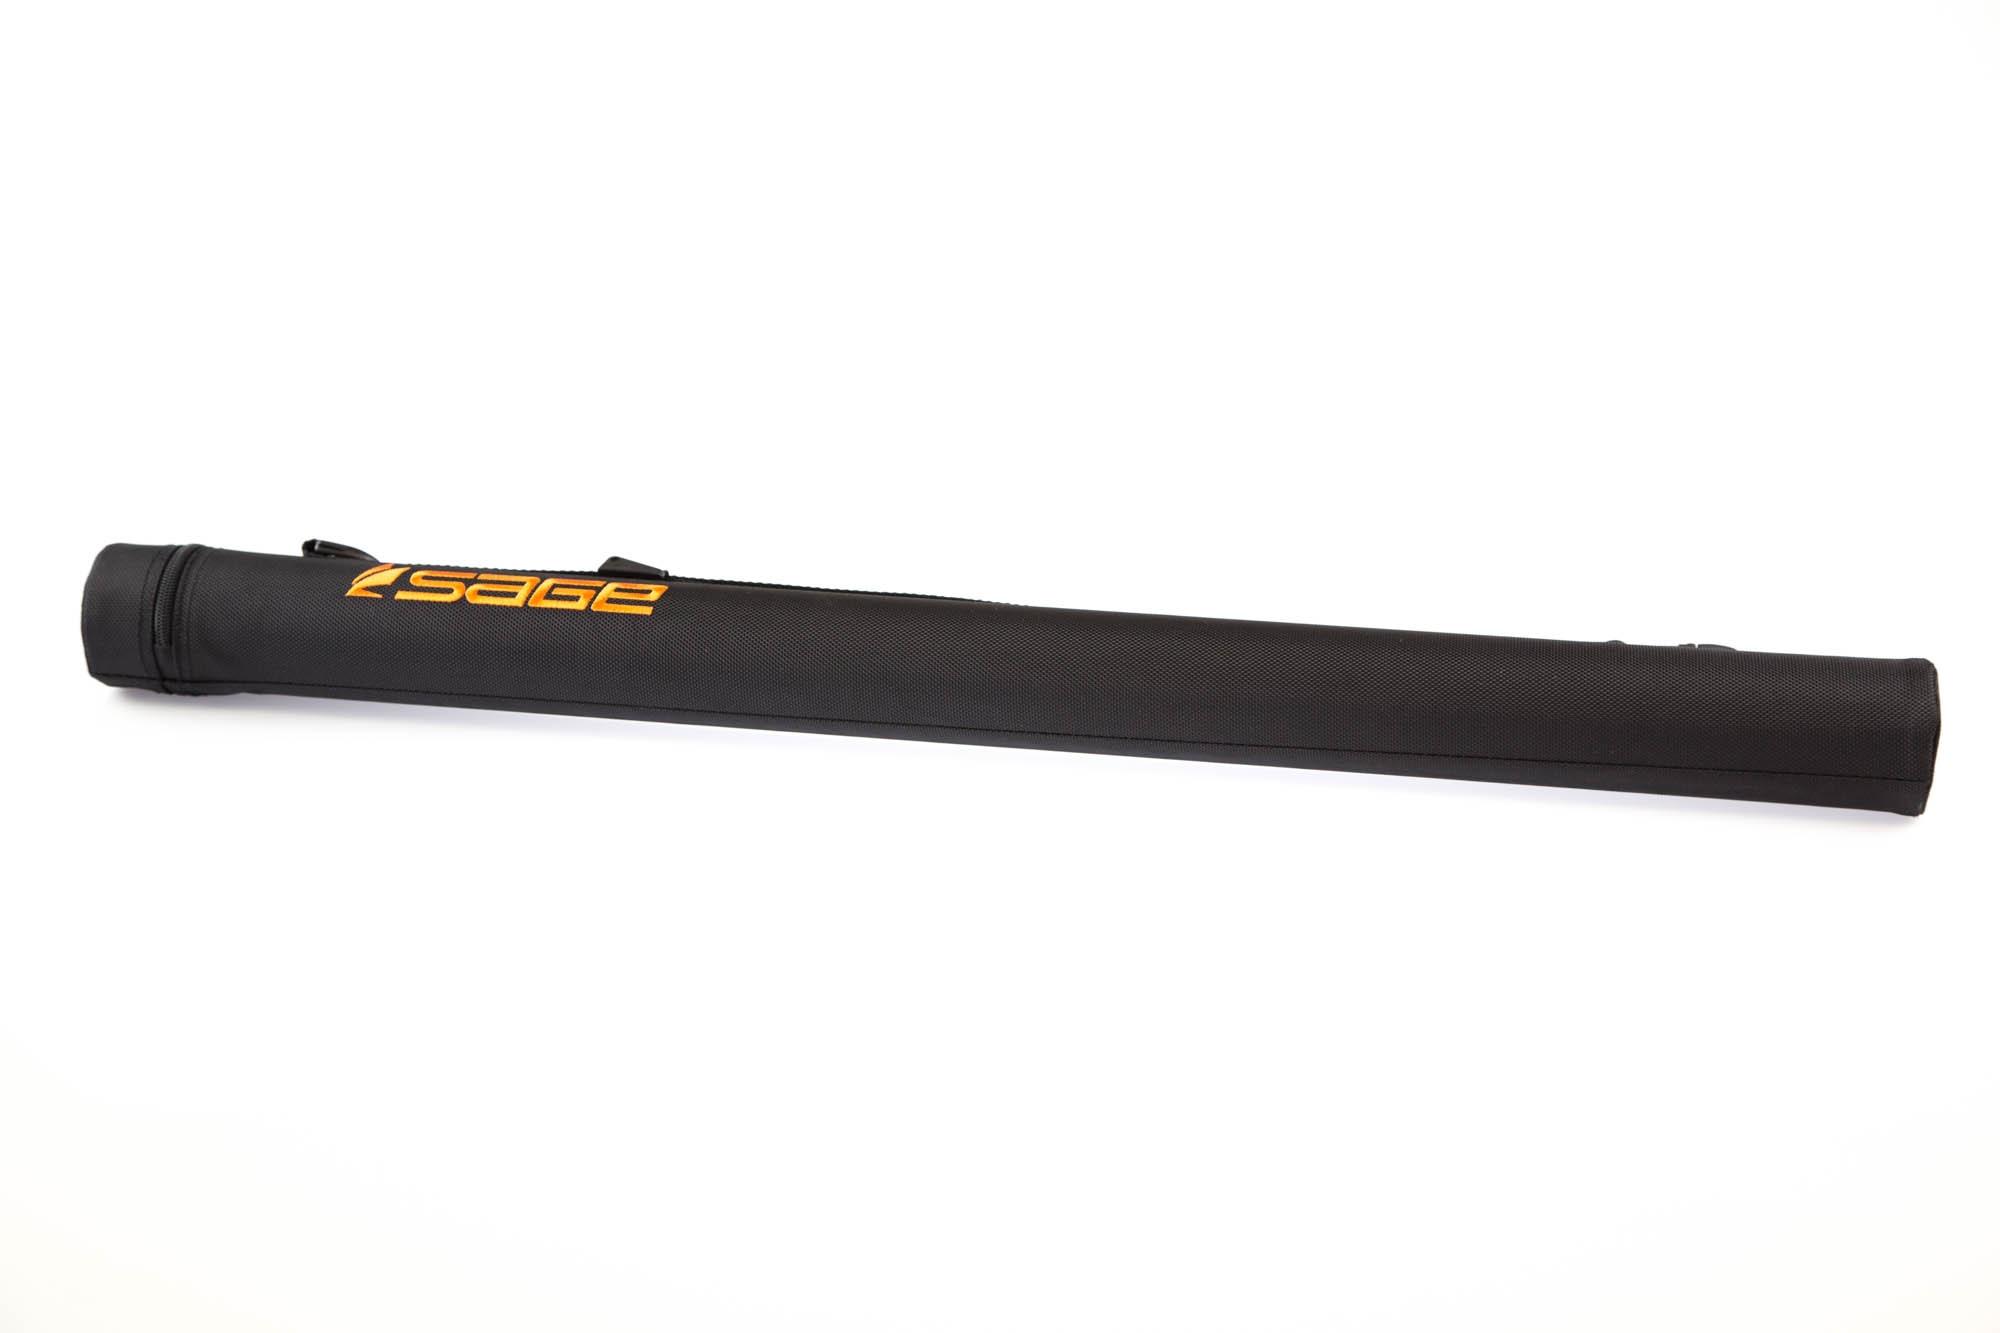 Sage Bolt Fly Rod 700